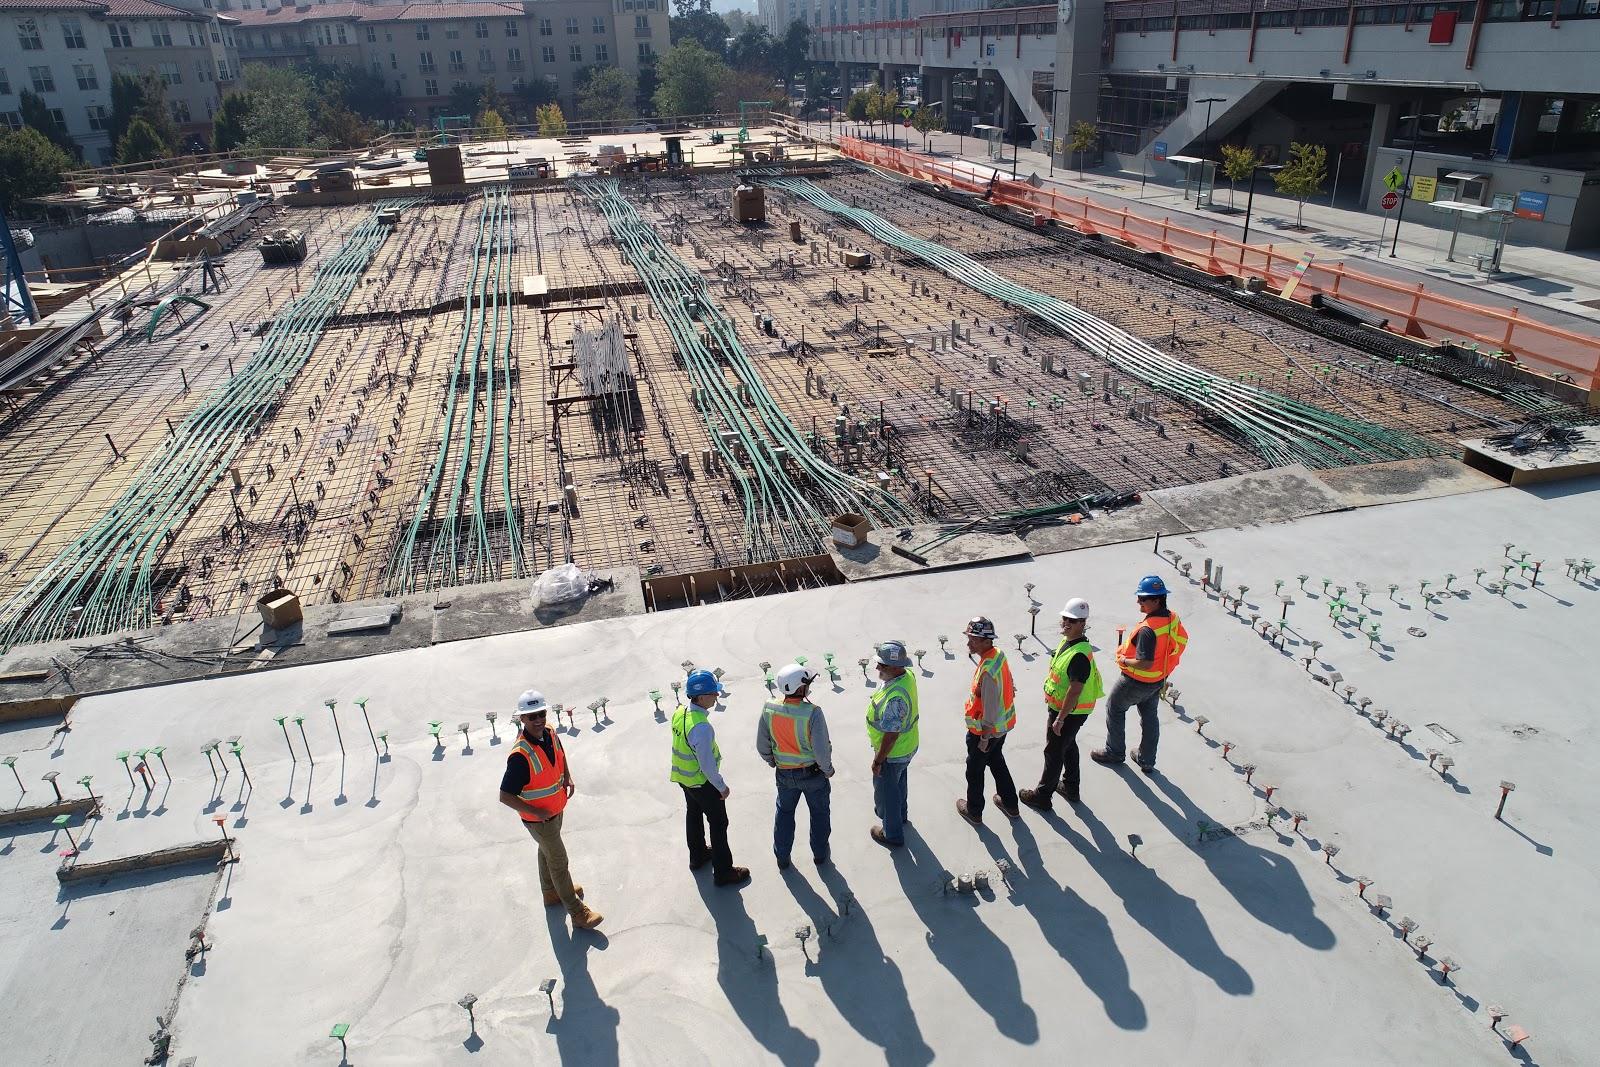 A construction crew stands atop a building and surveys a job site.